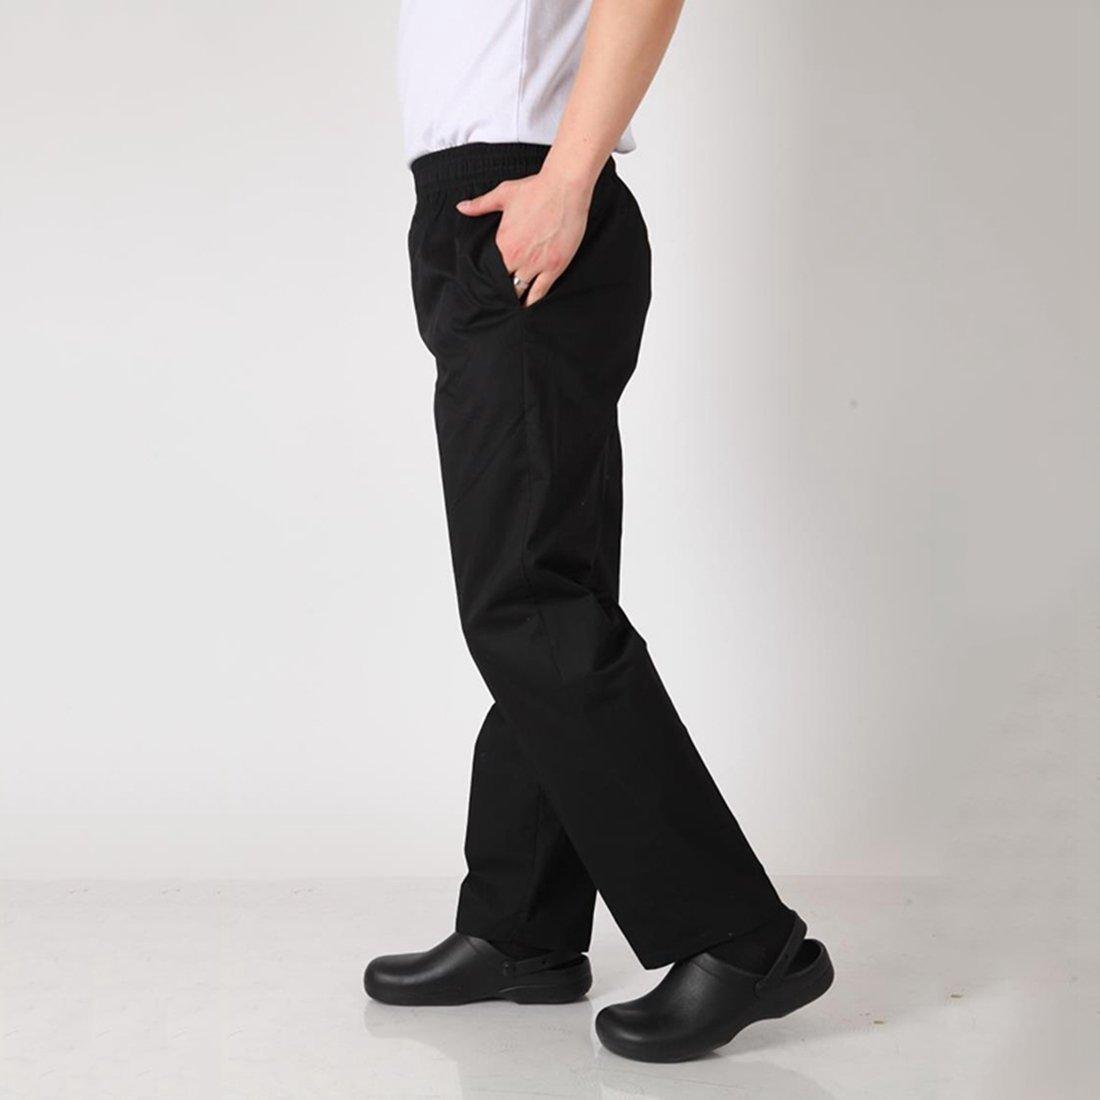 Enerhu Men Elastic Waist Baggy Chef Pants Pockets Hotel/Kitchen/Restaurant/Coffee Uniform Pants Asian M by Enerhu (Image #3)